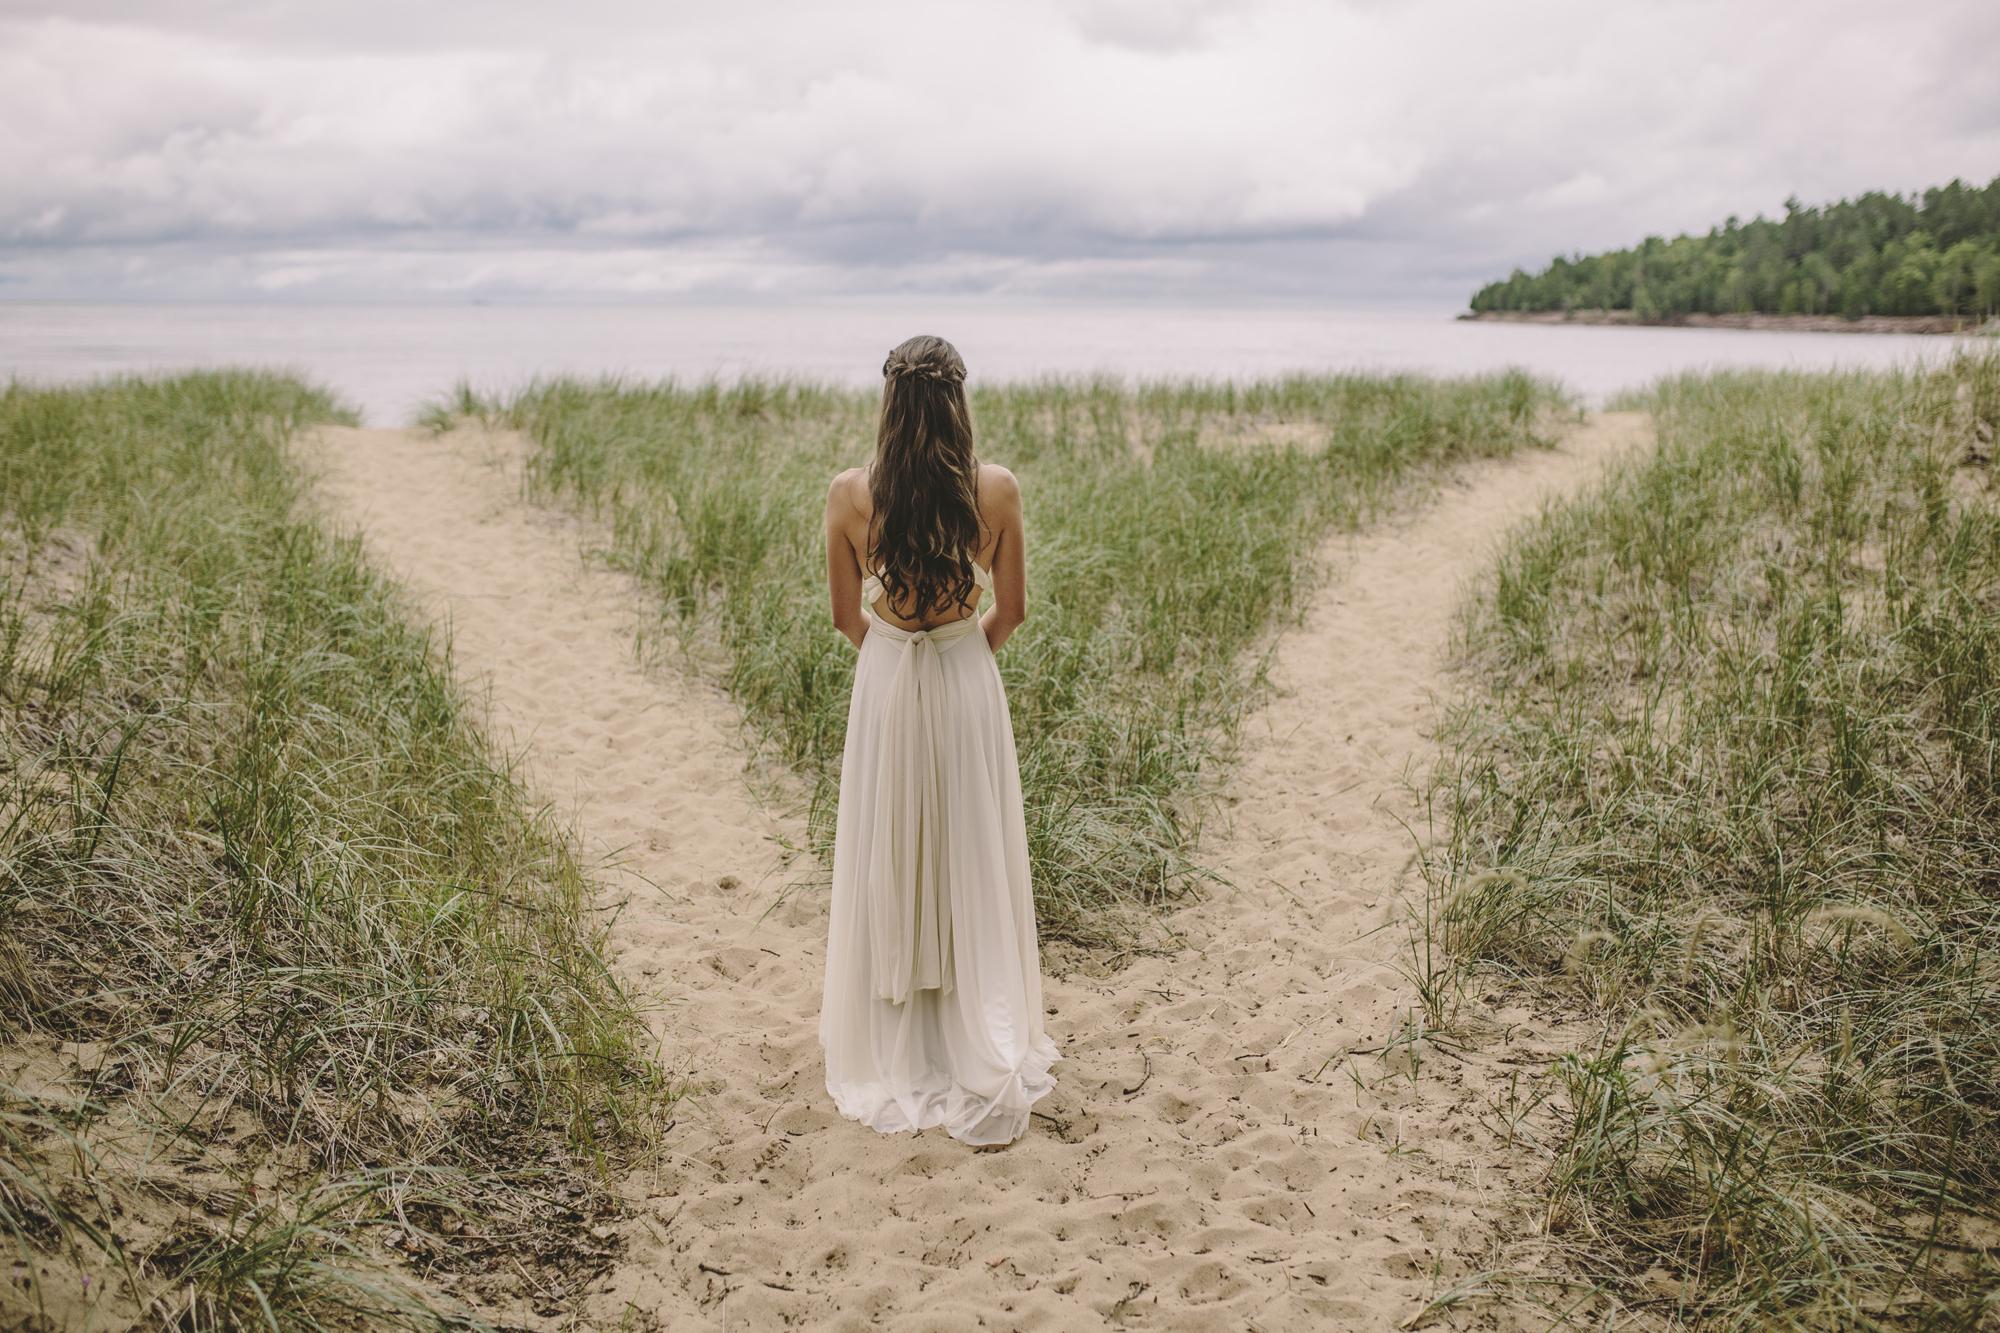 Brandon werth minnesota wedding photographer marquette michigan bride lake superior